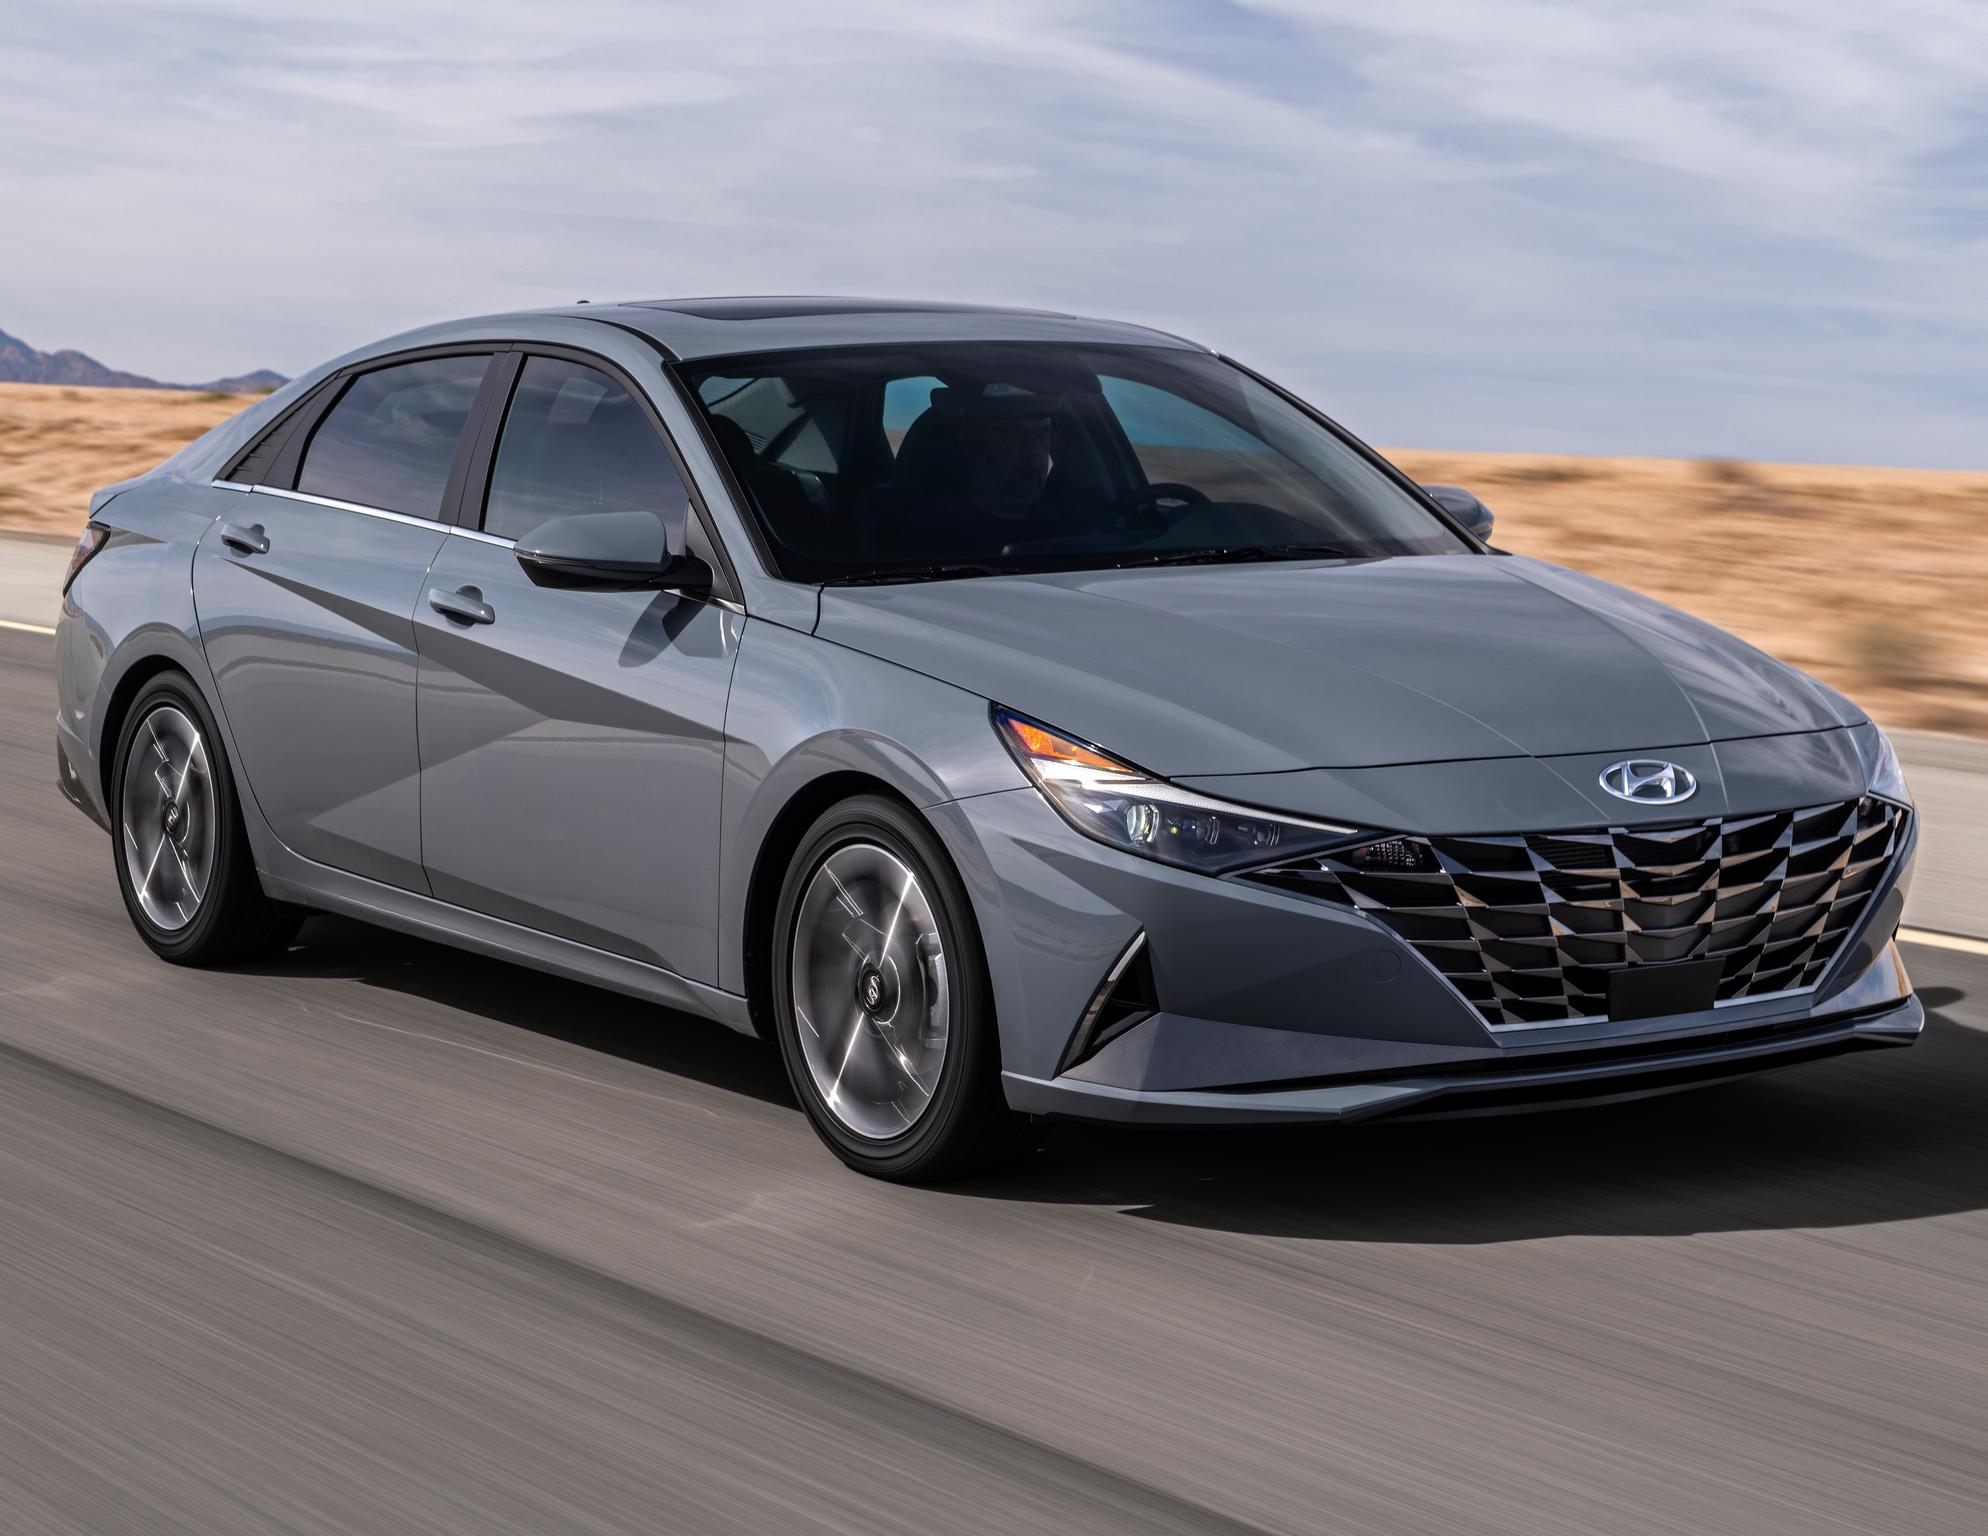 Hyundai Elantra Hybrid 2021 Seventh Generation Photos